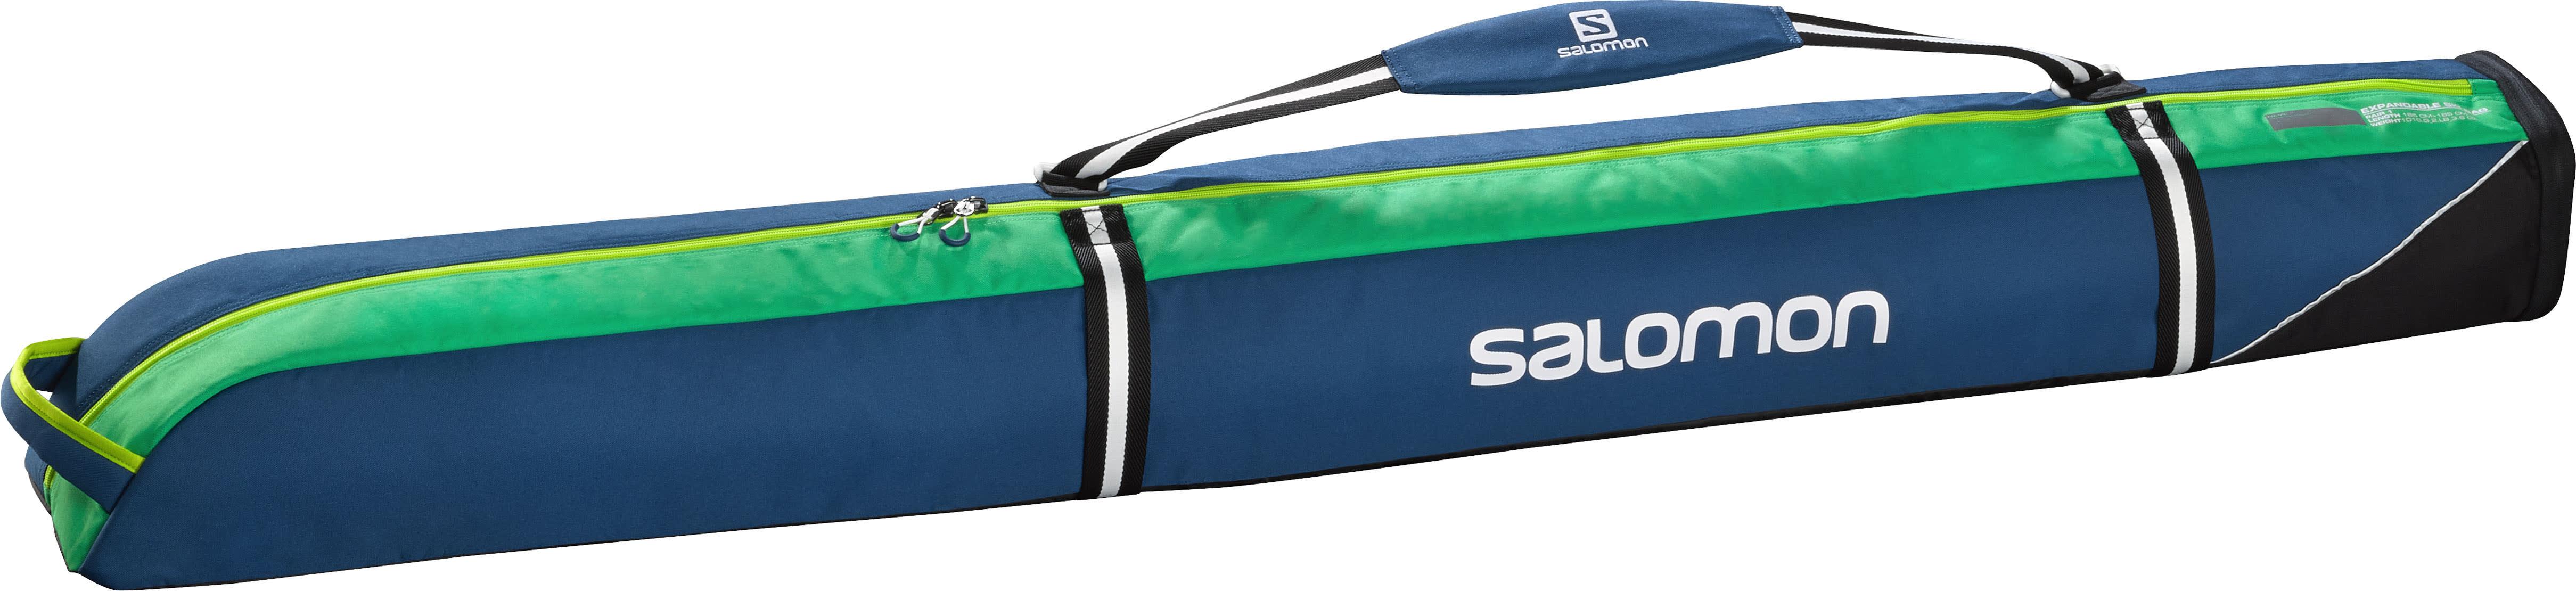 Salomon Extend 1 Pair 165 20 Padded Ski Bag